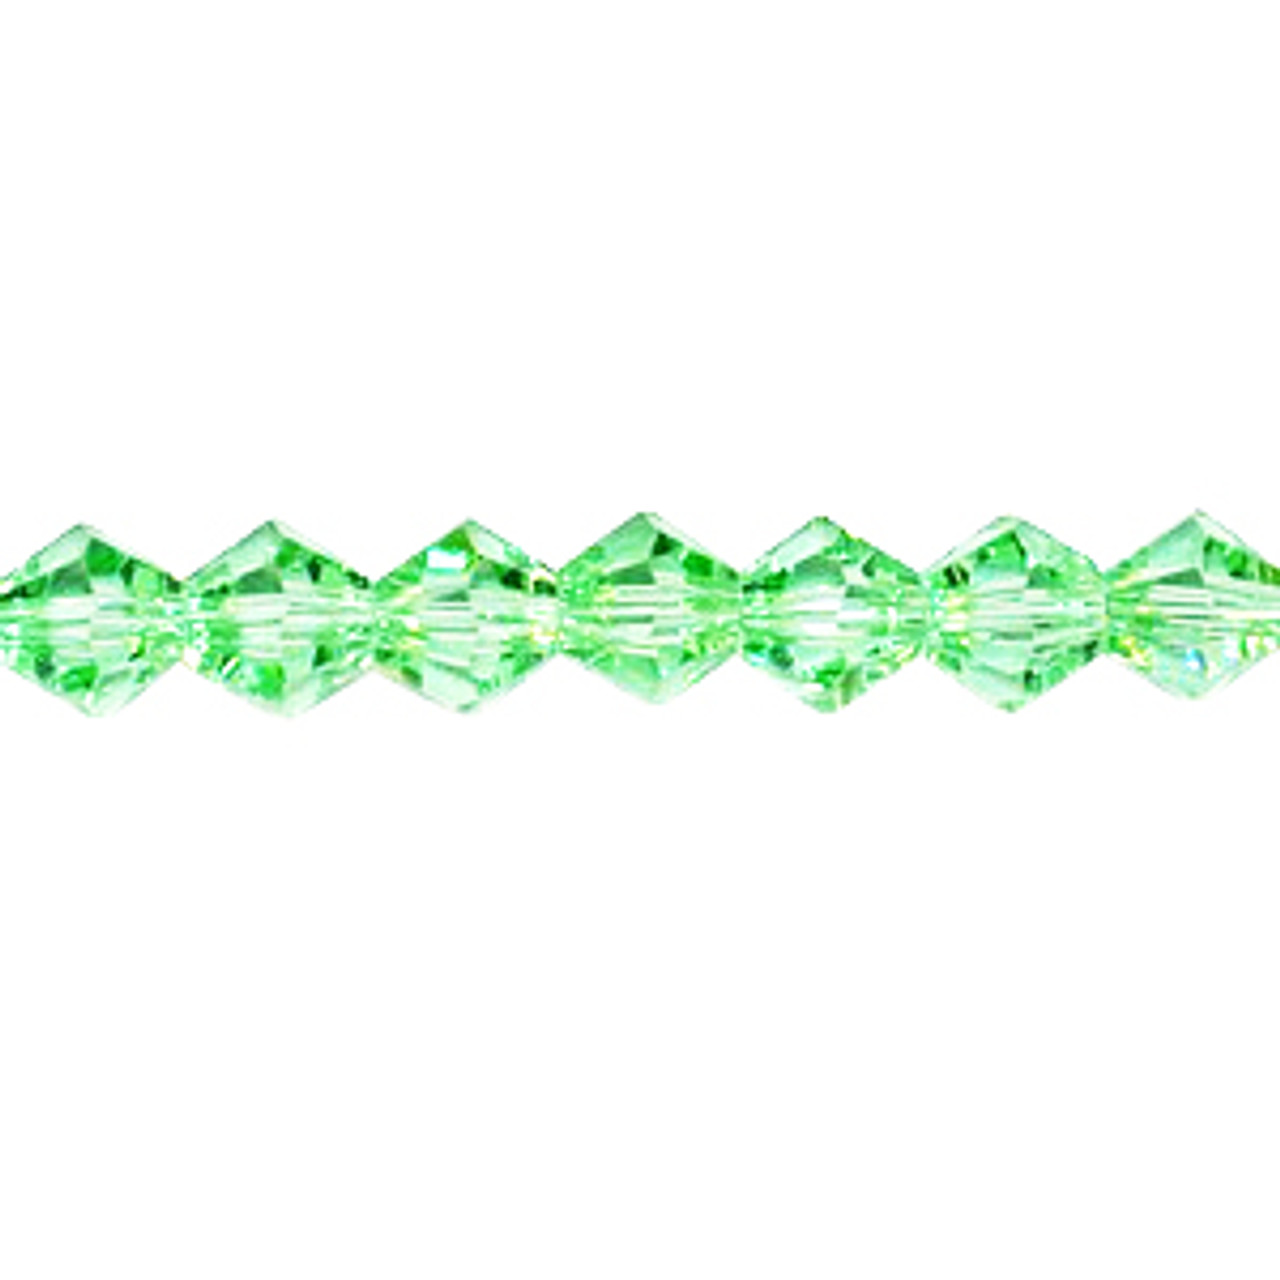 Chrysolite 3mm Thunder Polish Bicone Crystals